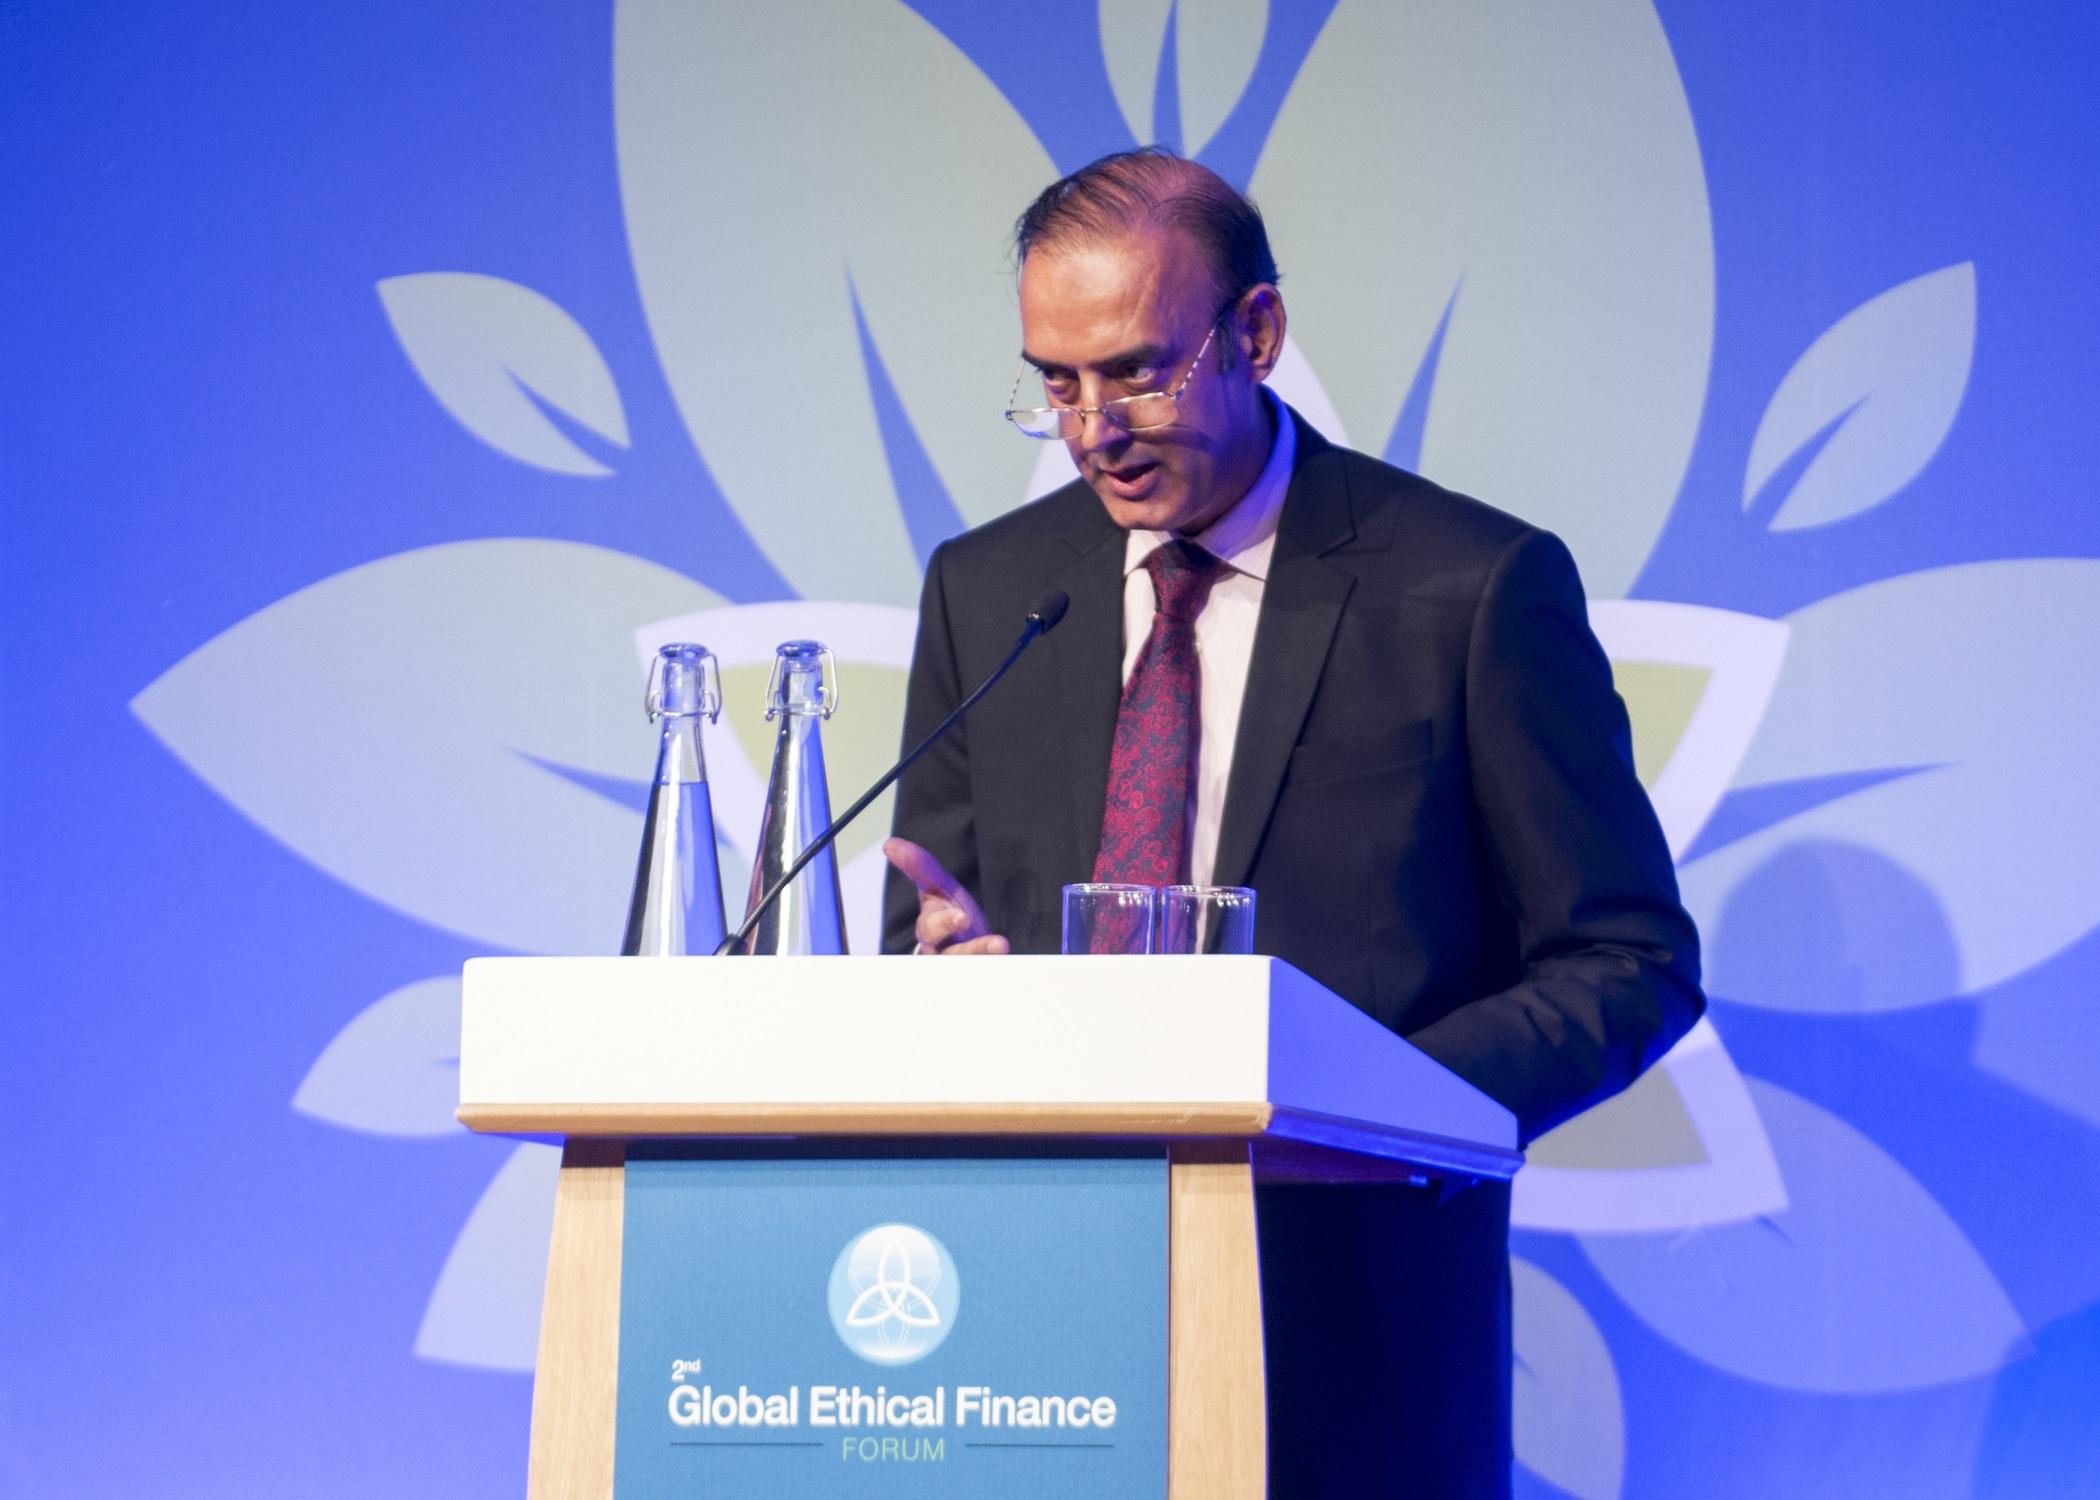 Global Ethical Finance Forum. Edinburgh, Midlothian, UK, 14, September, 2017 Credit: Ian Jacobs Pic shows: Jameel Ahmad, Deputy Governor, State Bank of Pakistan (SBP).